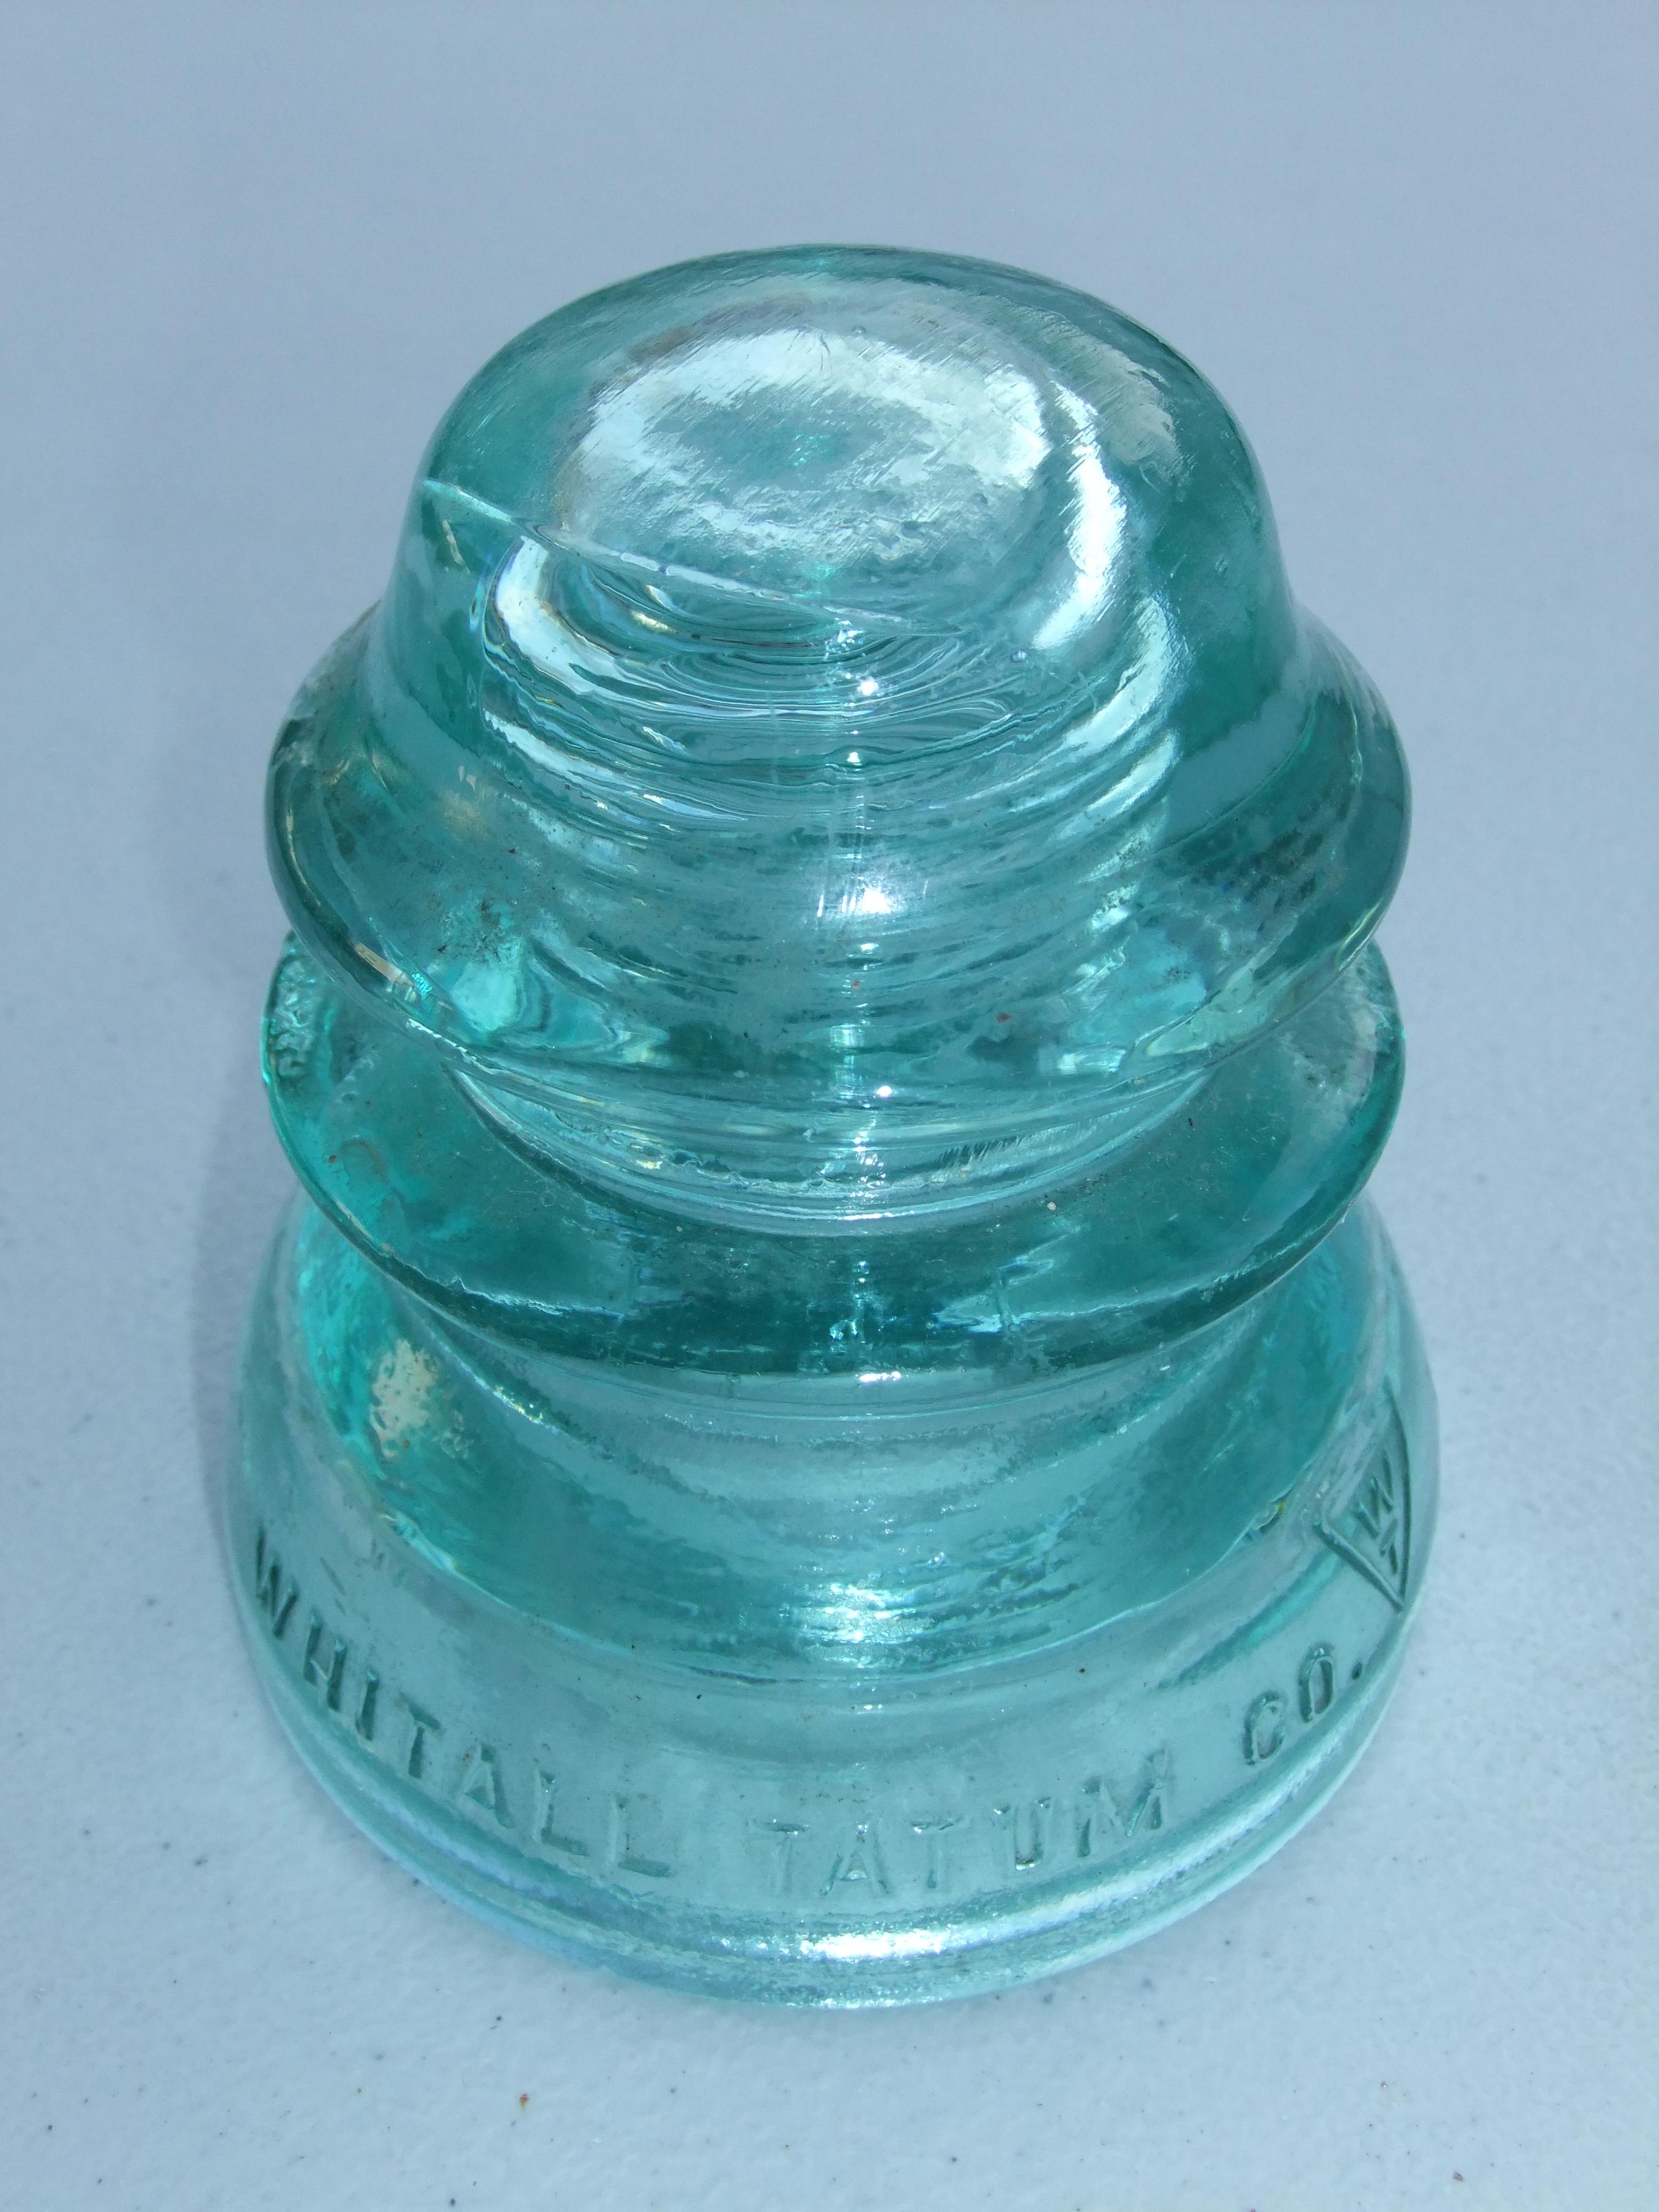 Whithall Tatum Aqua Blue Green Glass Insulator no 10